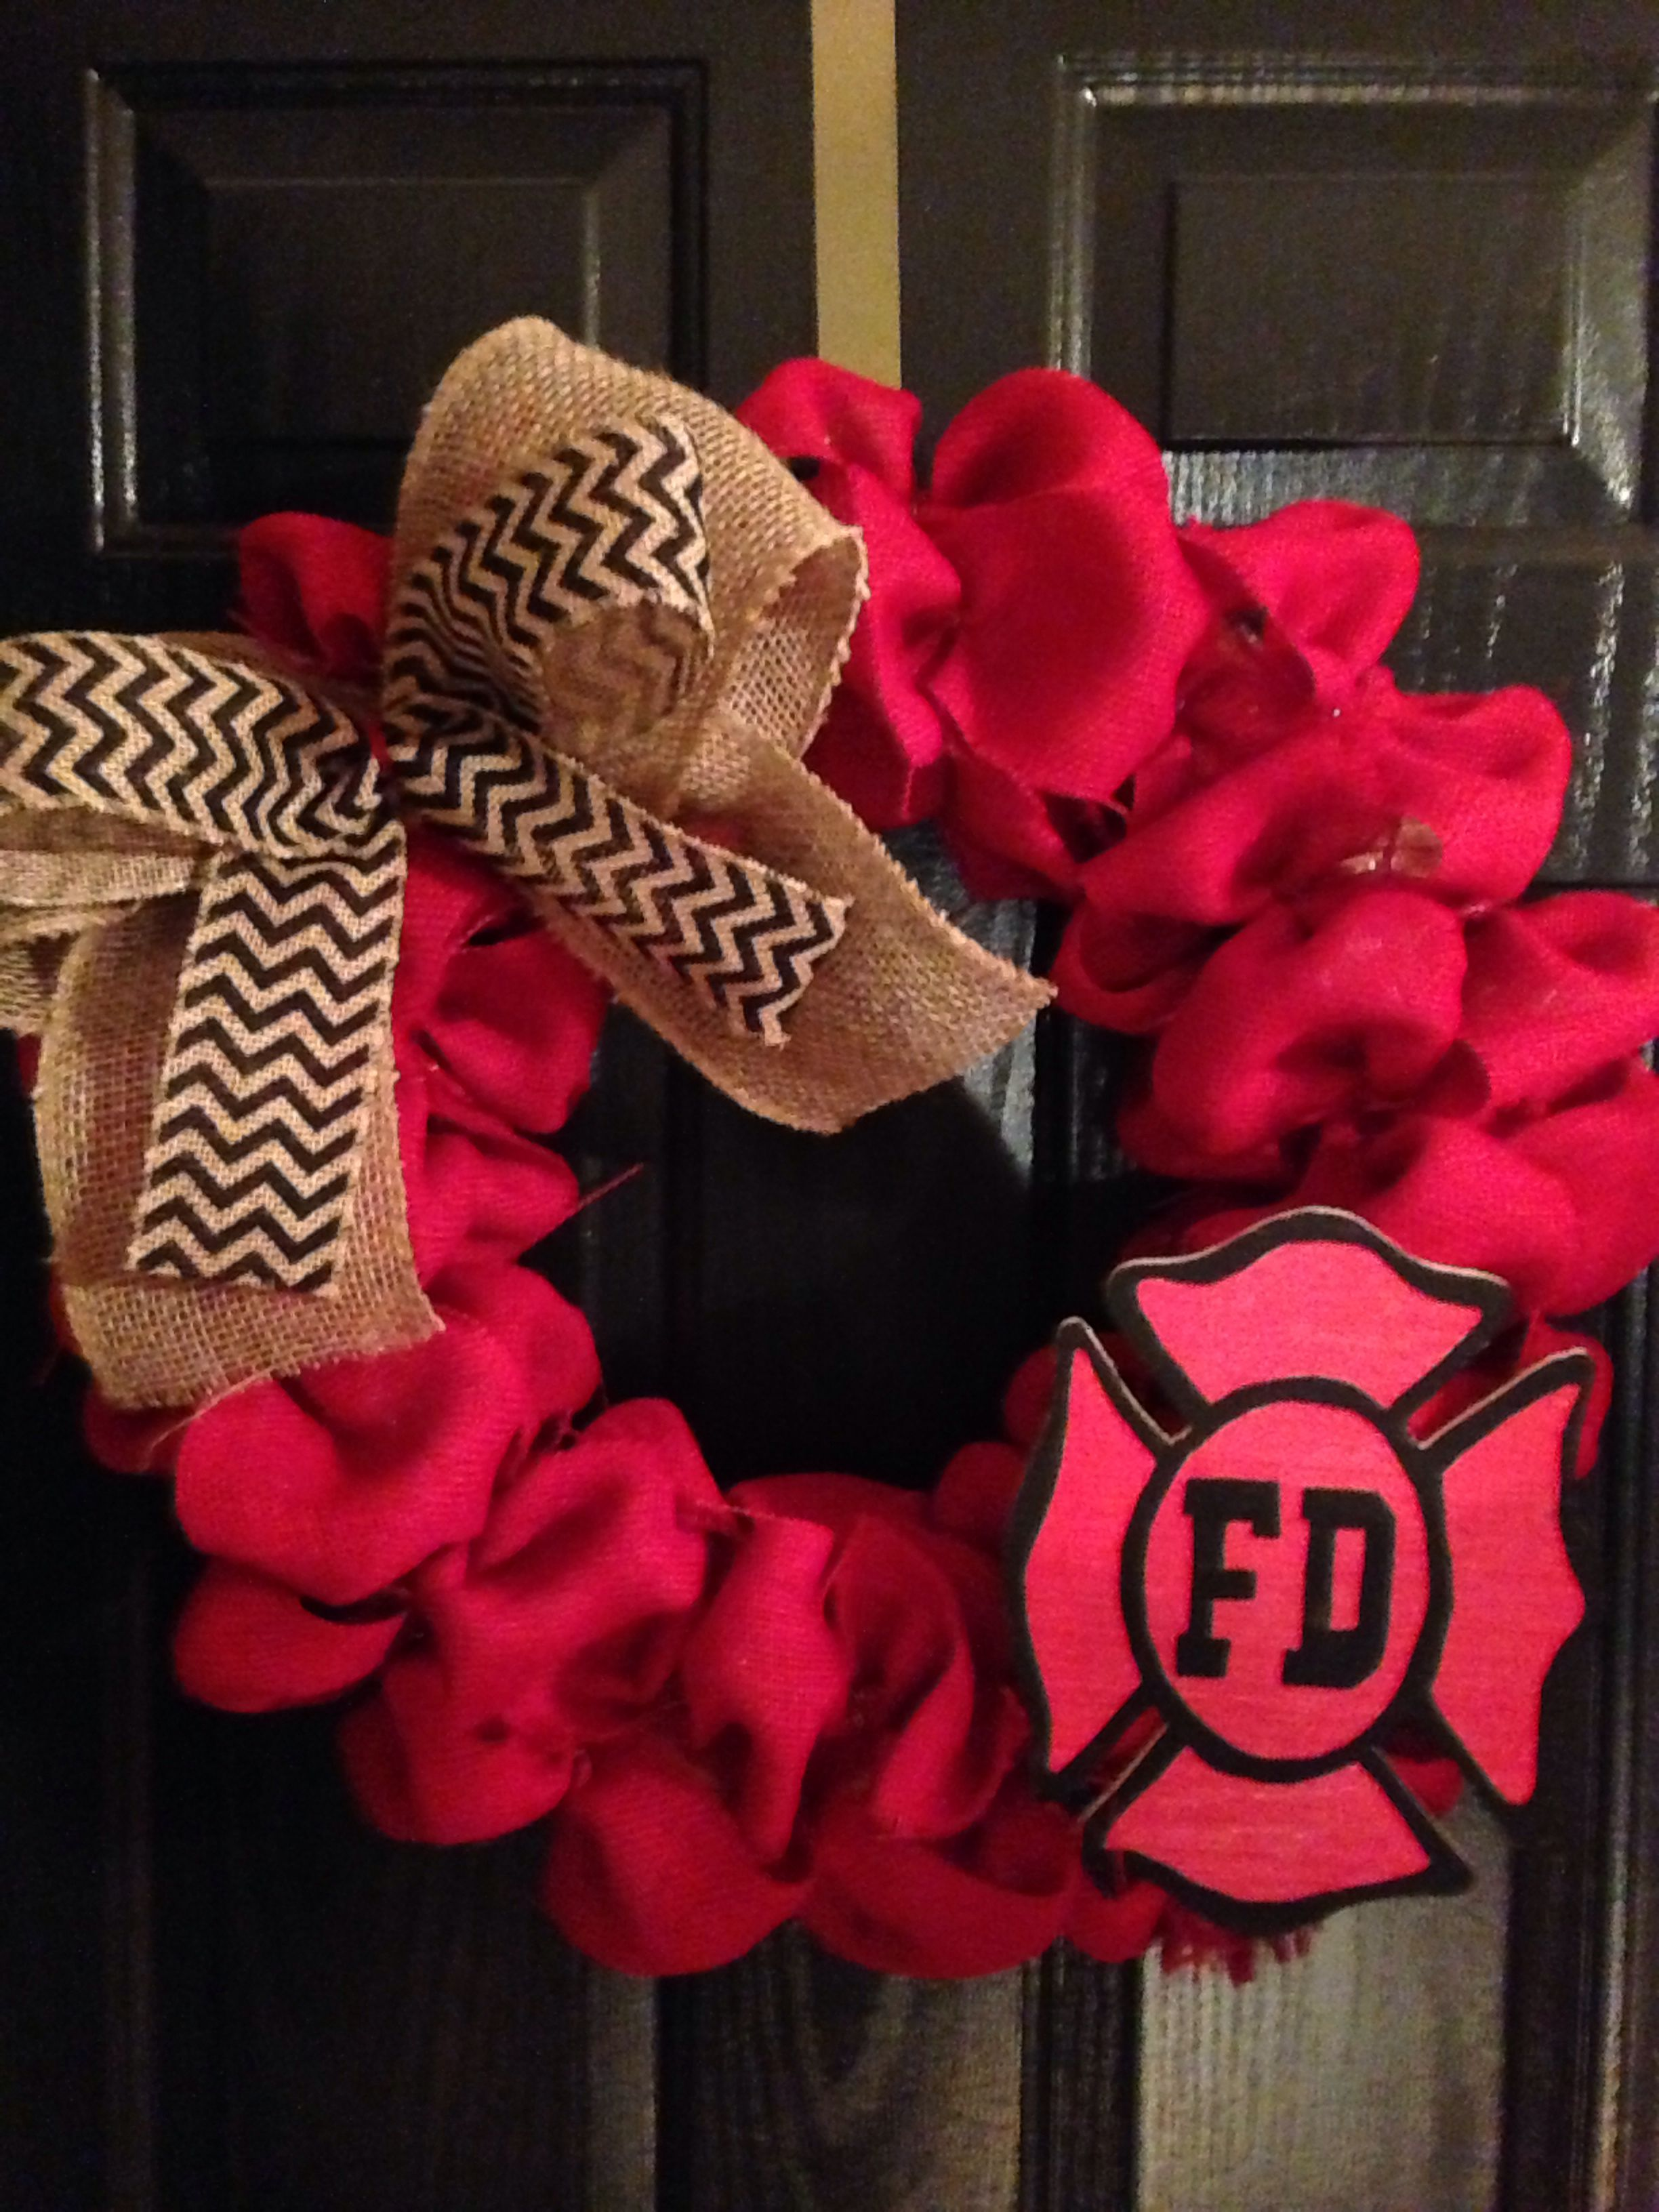 Fire Department Christmas Gifts Part - 46: Fire Department Burlap Wreath